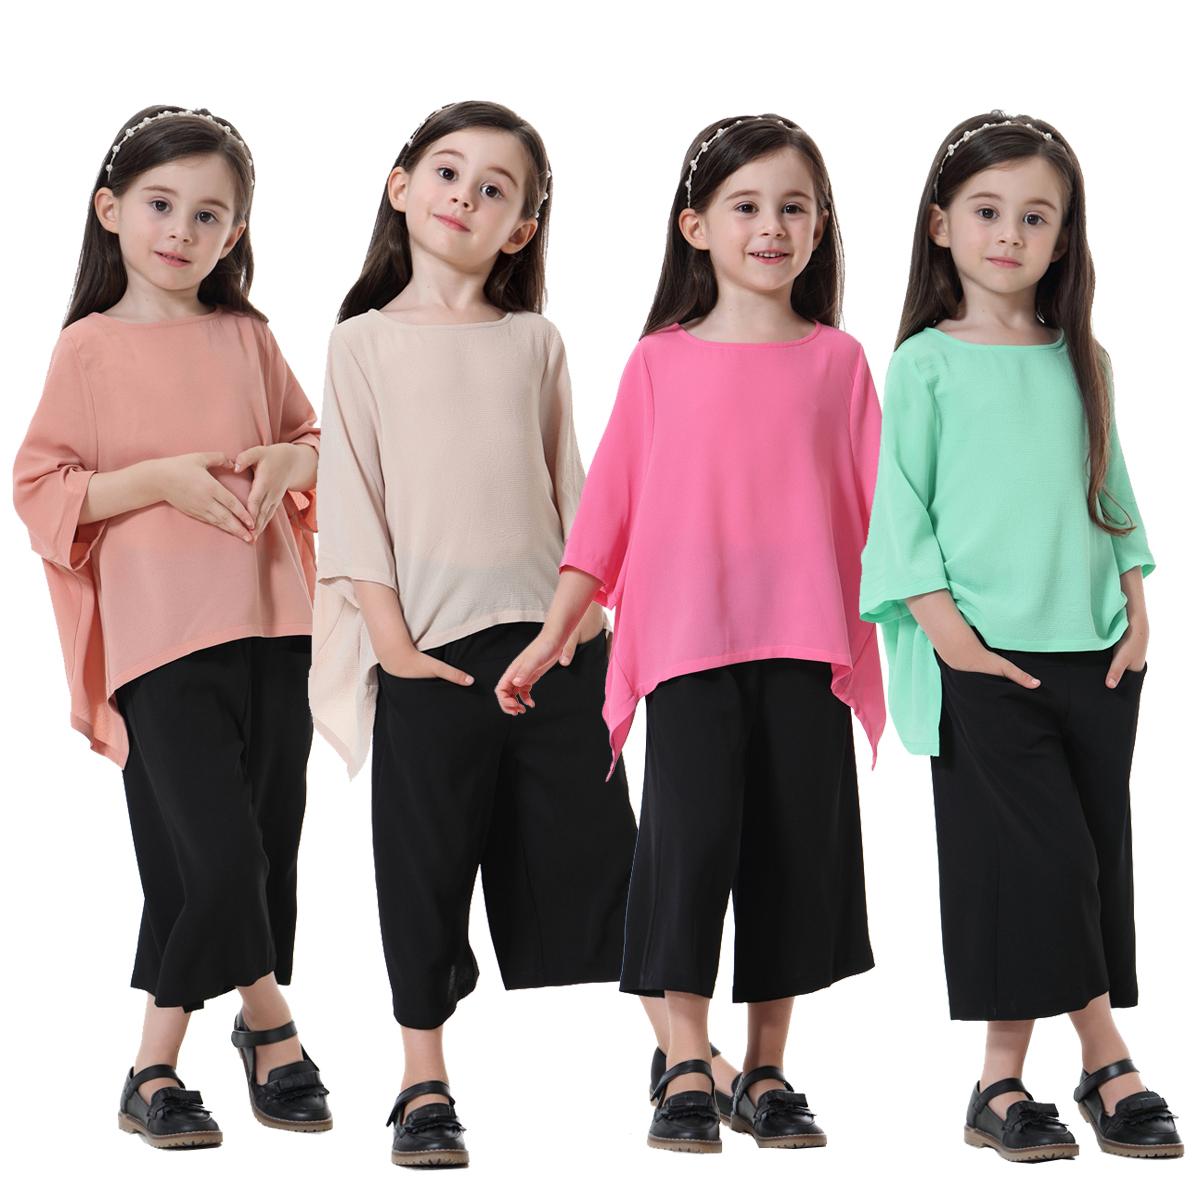 6591b9da40bb Set Kids Girls Summer Clothes Top+wide-leg Pant Muslim Islamic Abaya ...